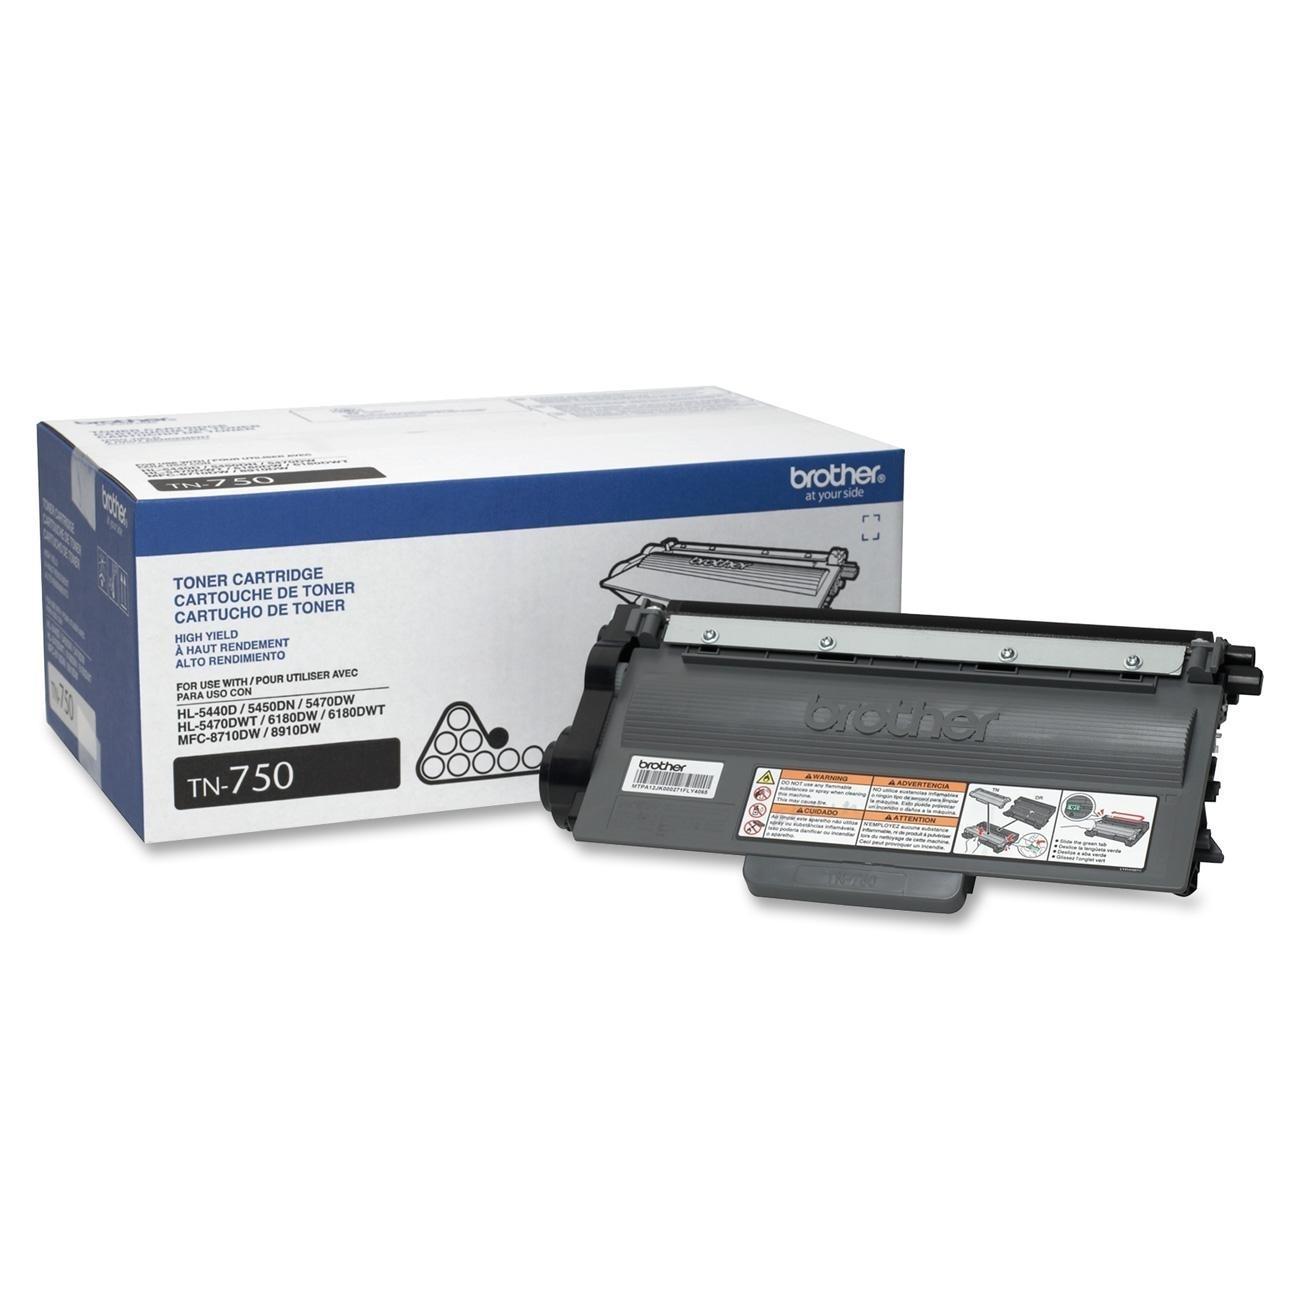 Brother-TN-750-OEM-Black-Toner-Cartridge-High-Yield